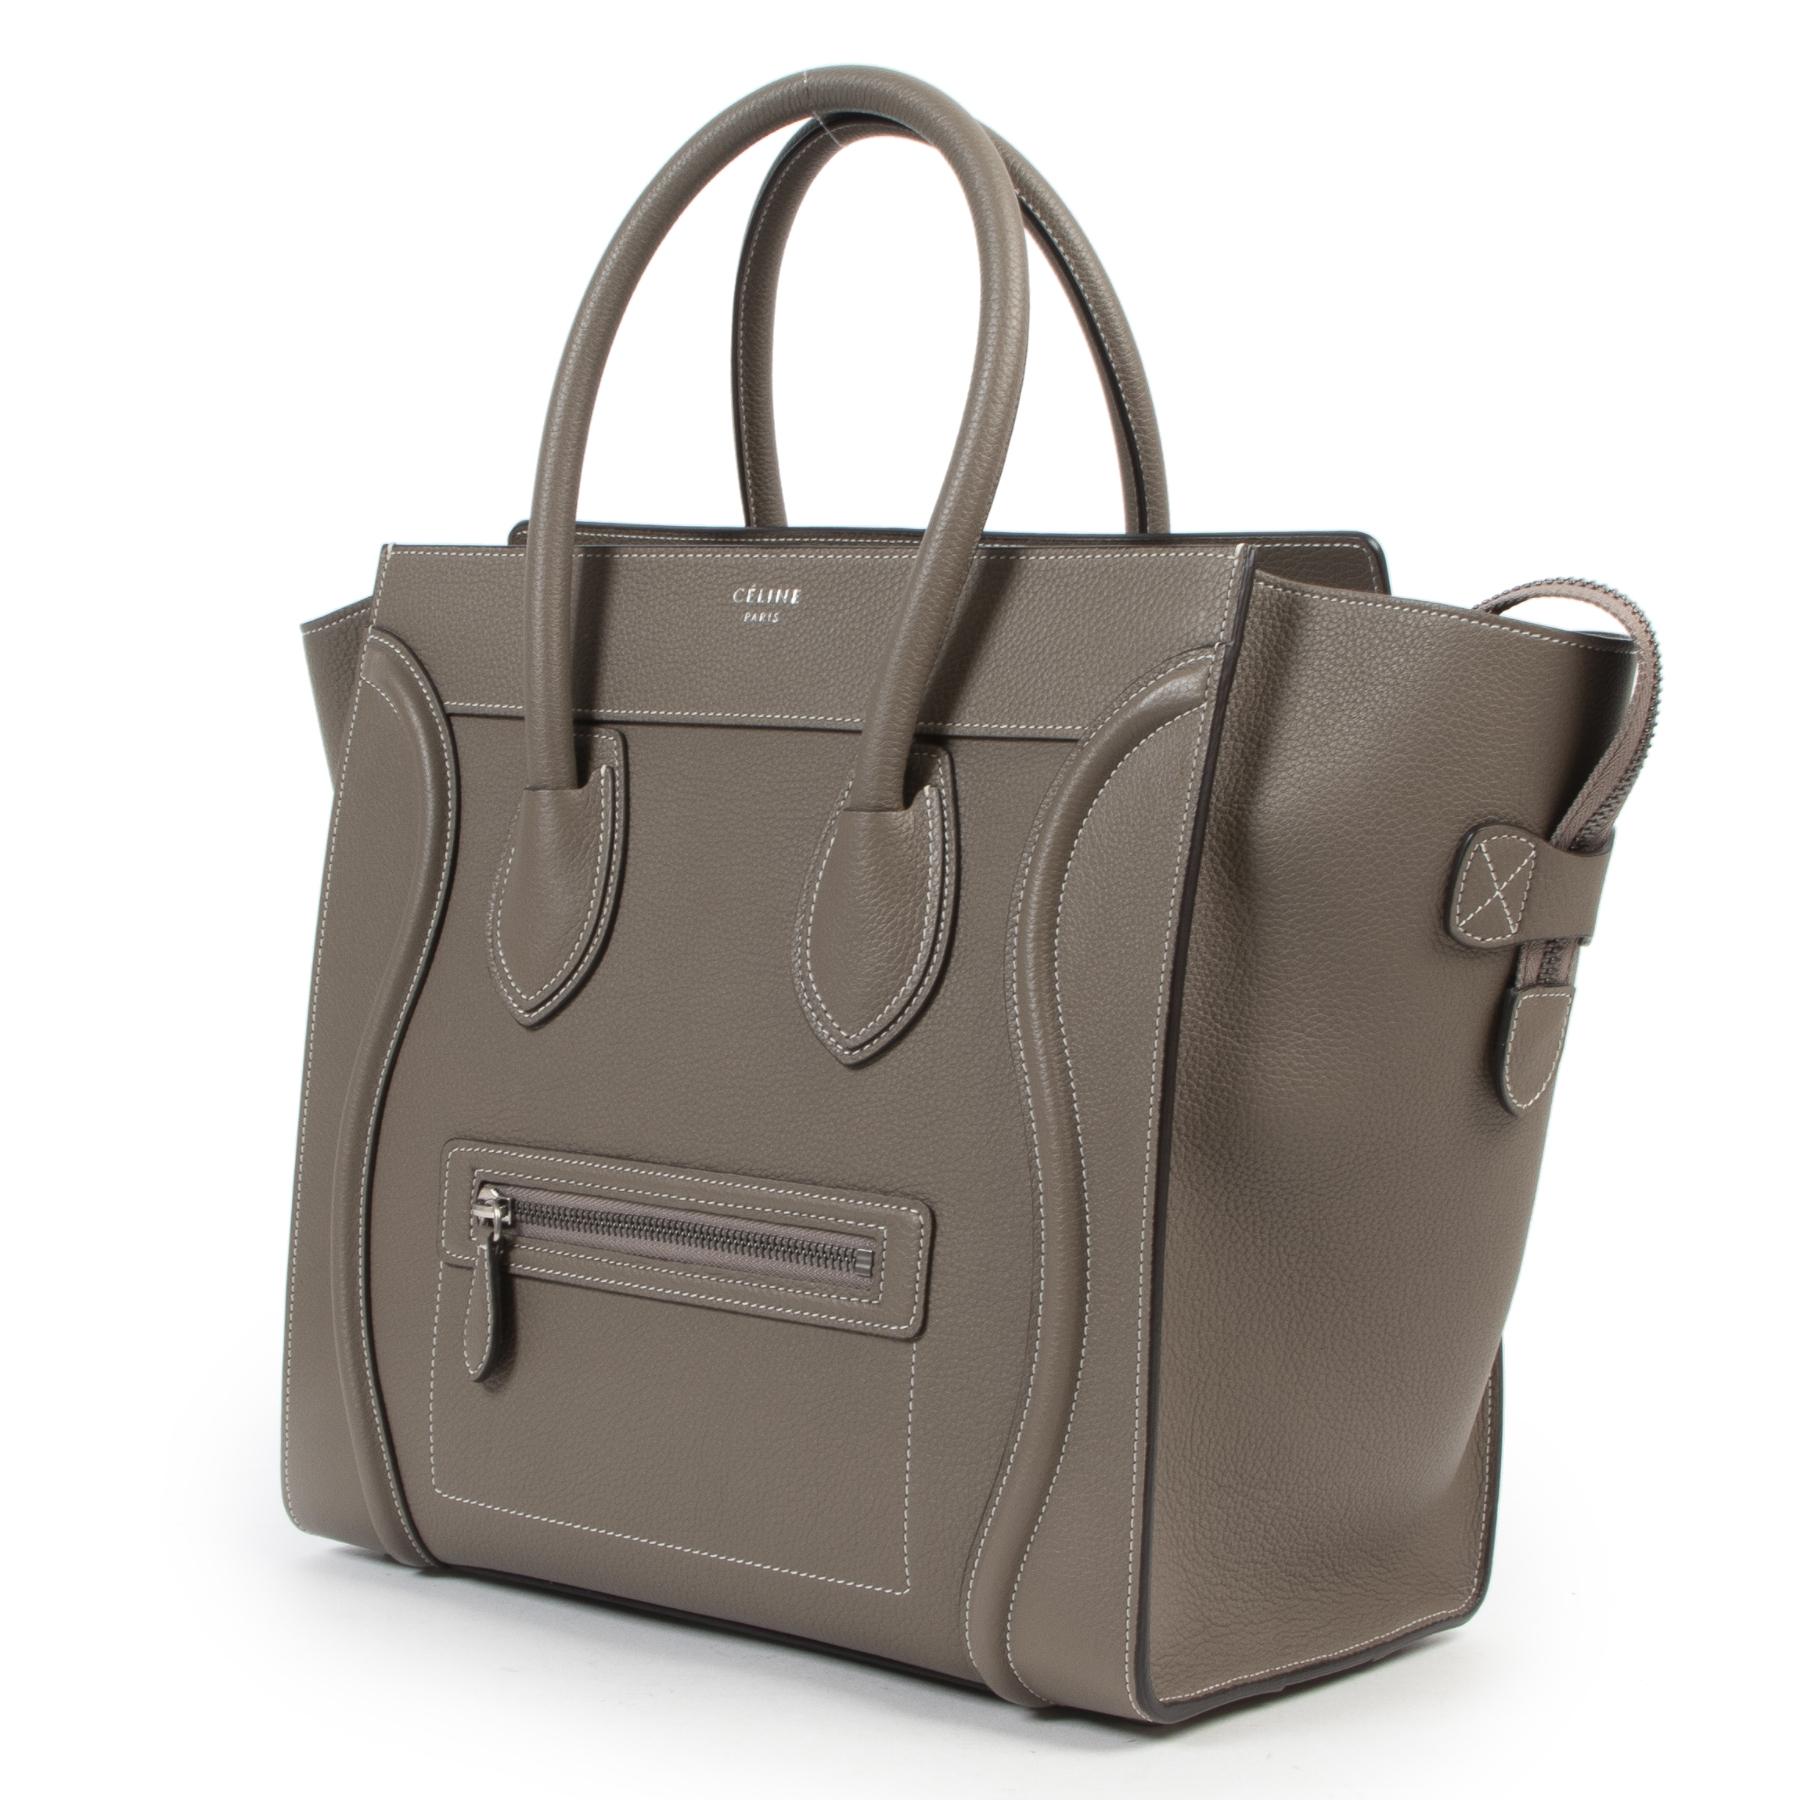 Céline Souri Mini Luggage Tote shop safe online